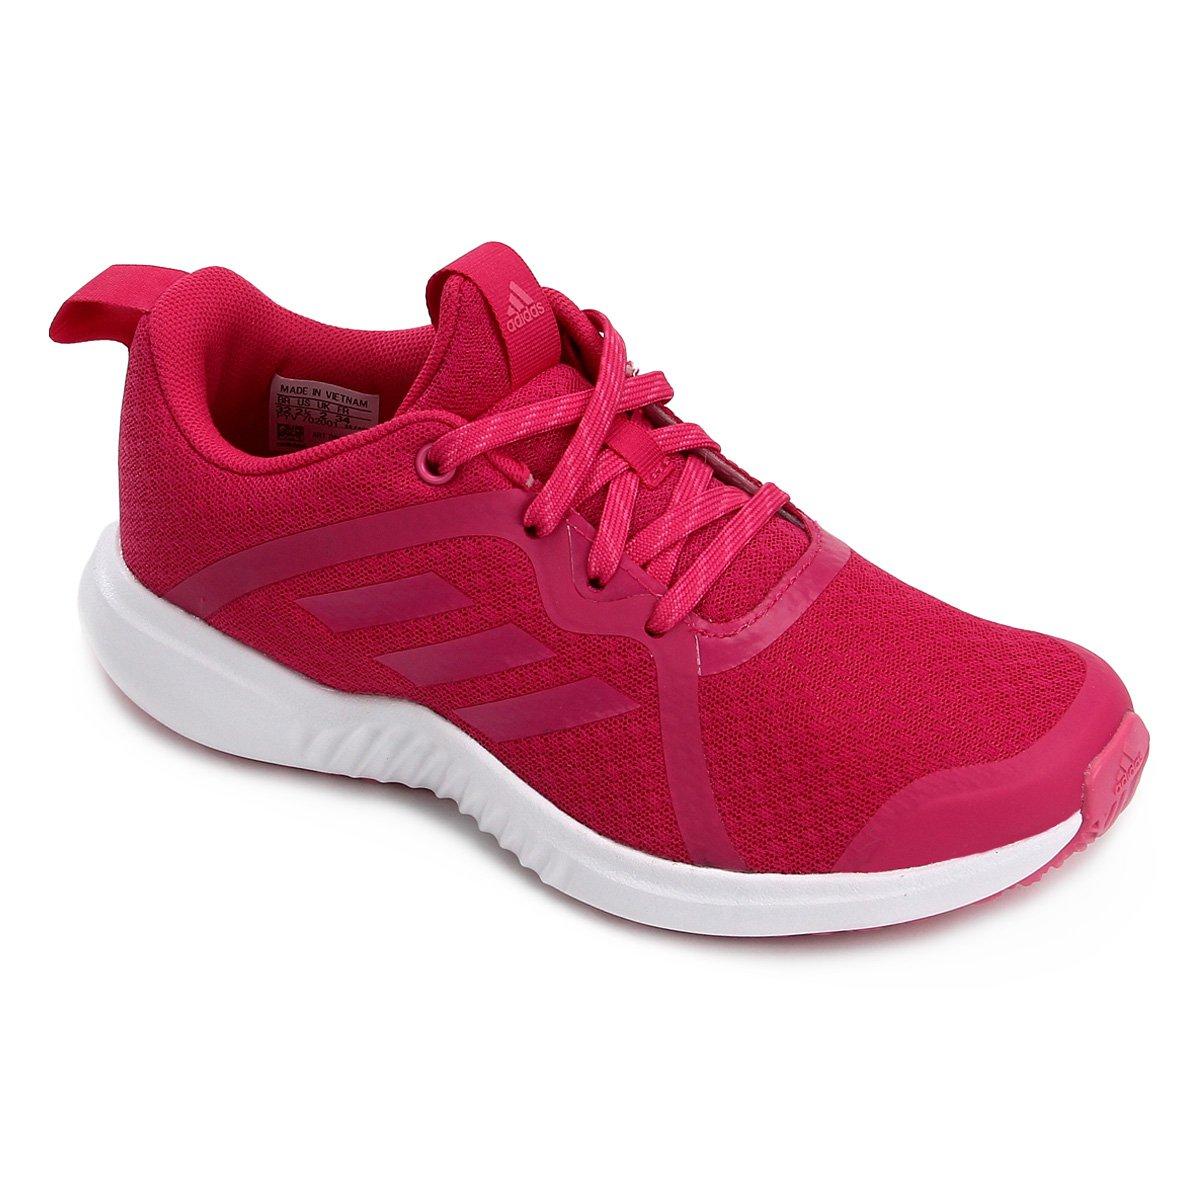 b49d1f898f8 Tênis Infantil Adidas Fortarun X K - Pink - Compre Agora